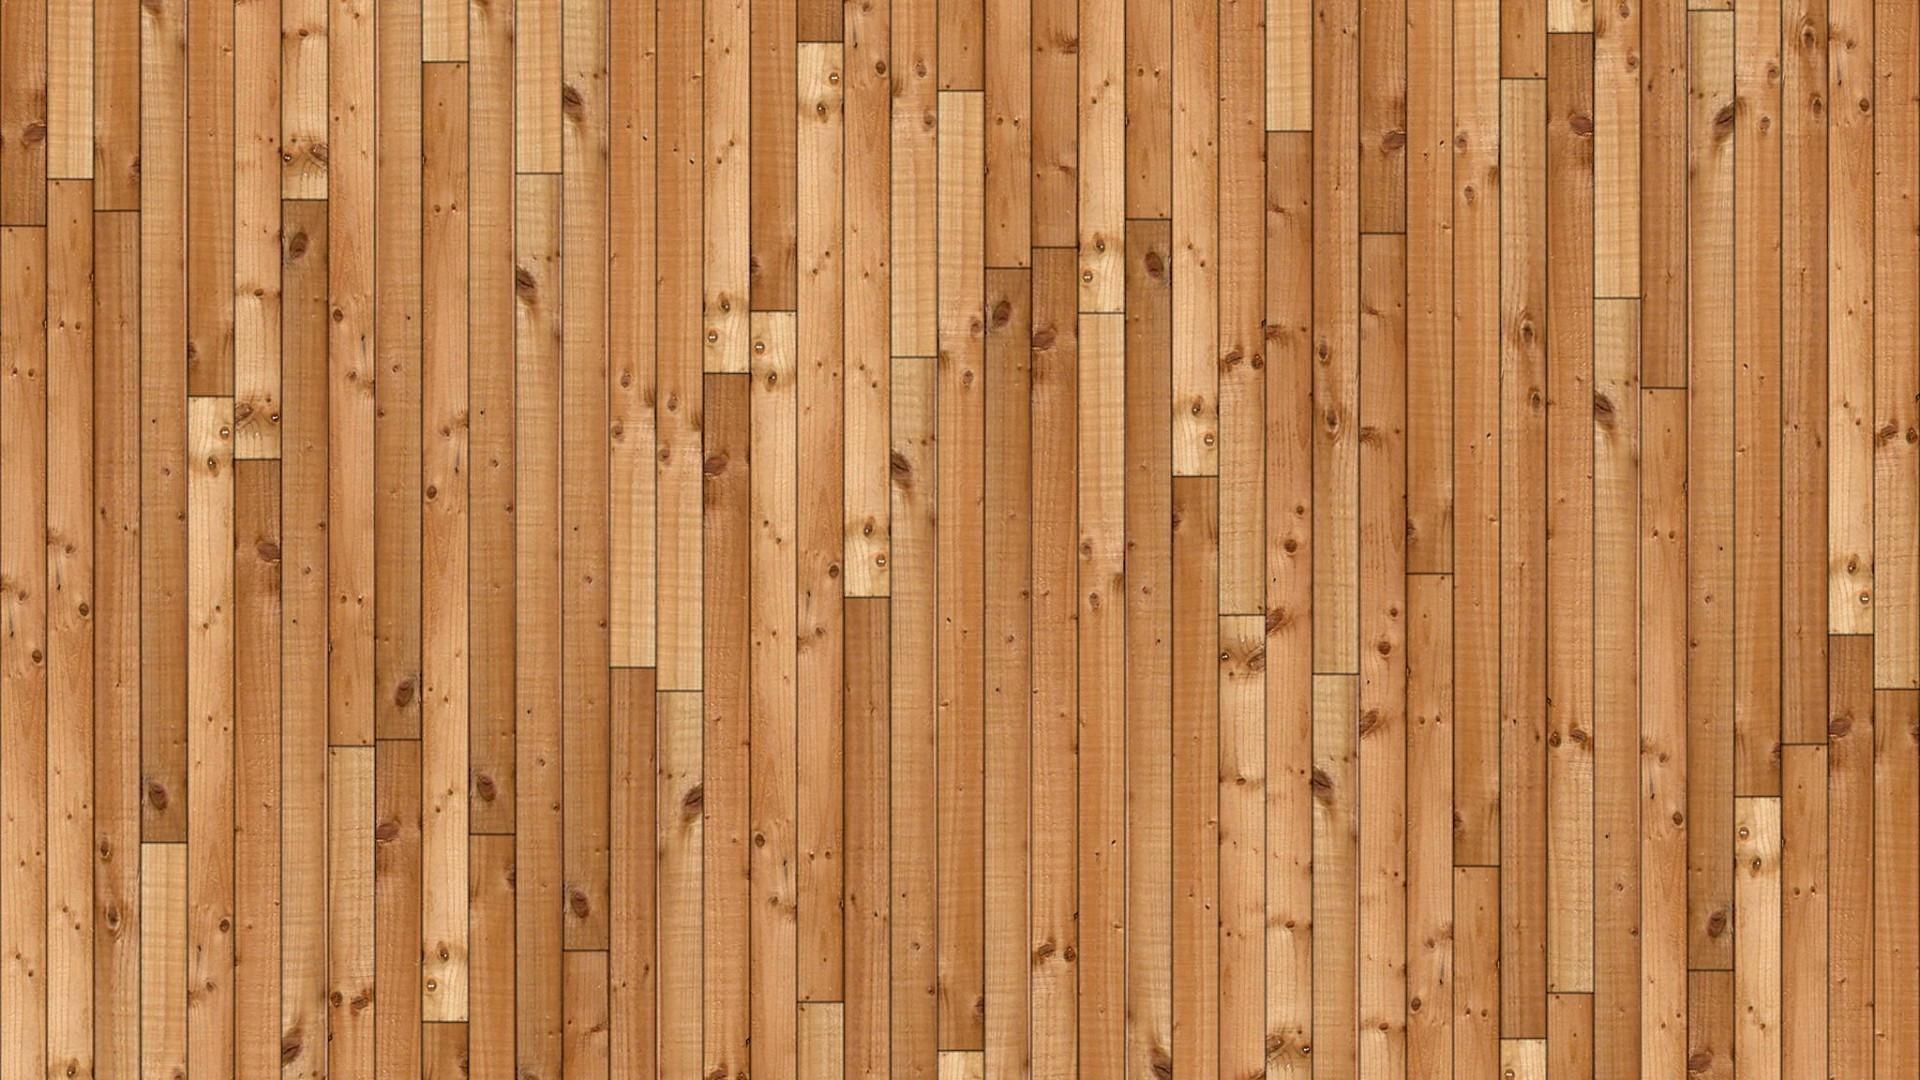 … Wood Wallpaper (2) …